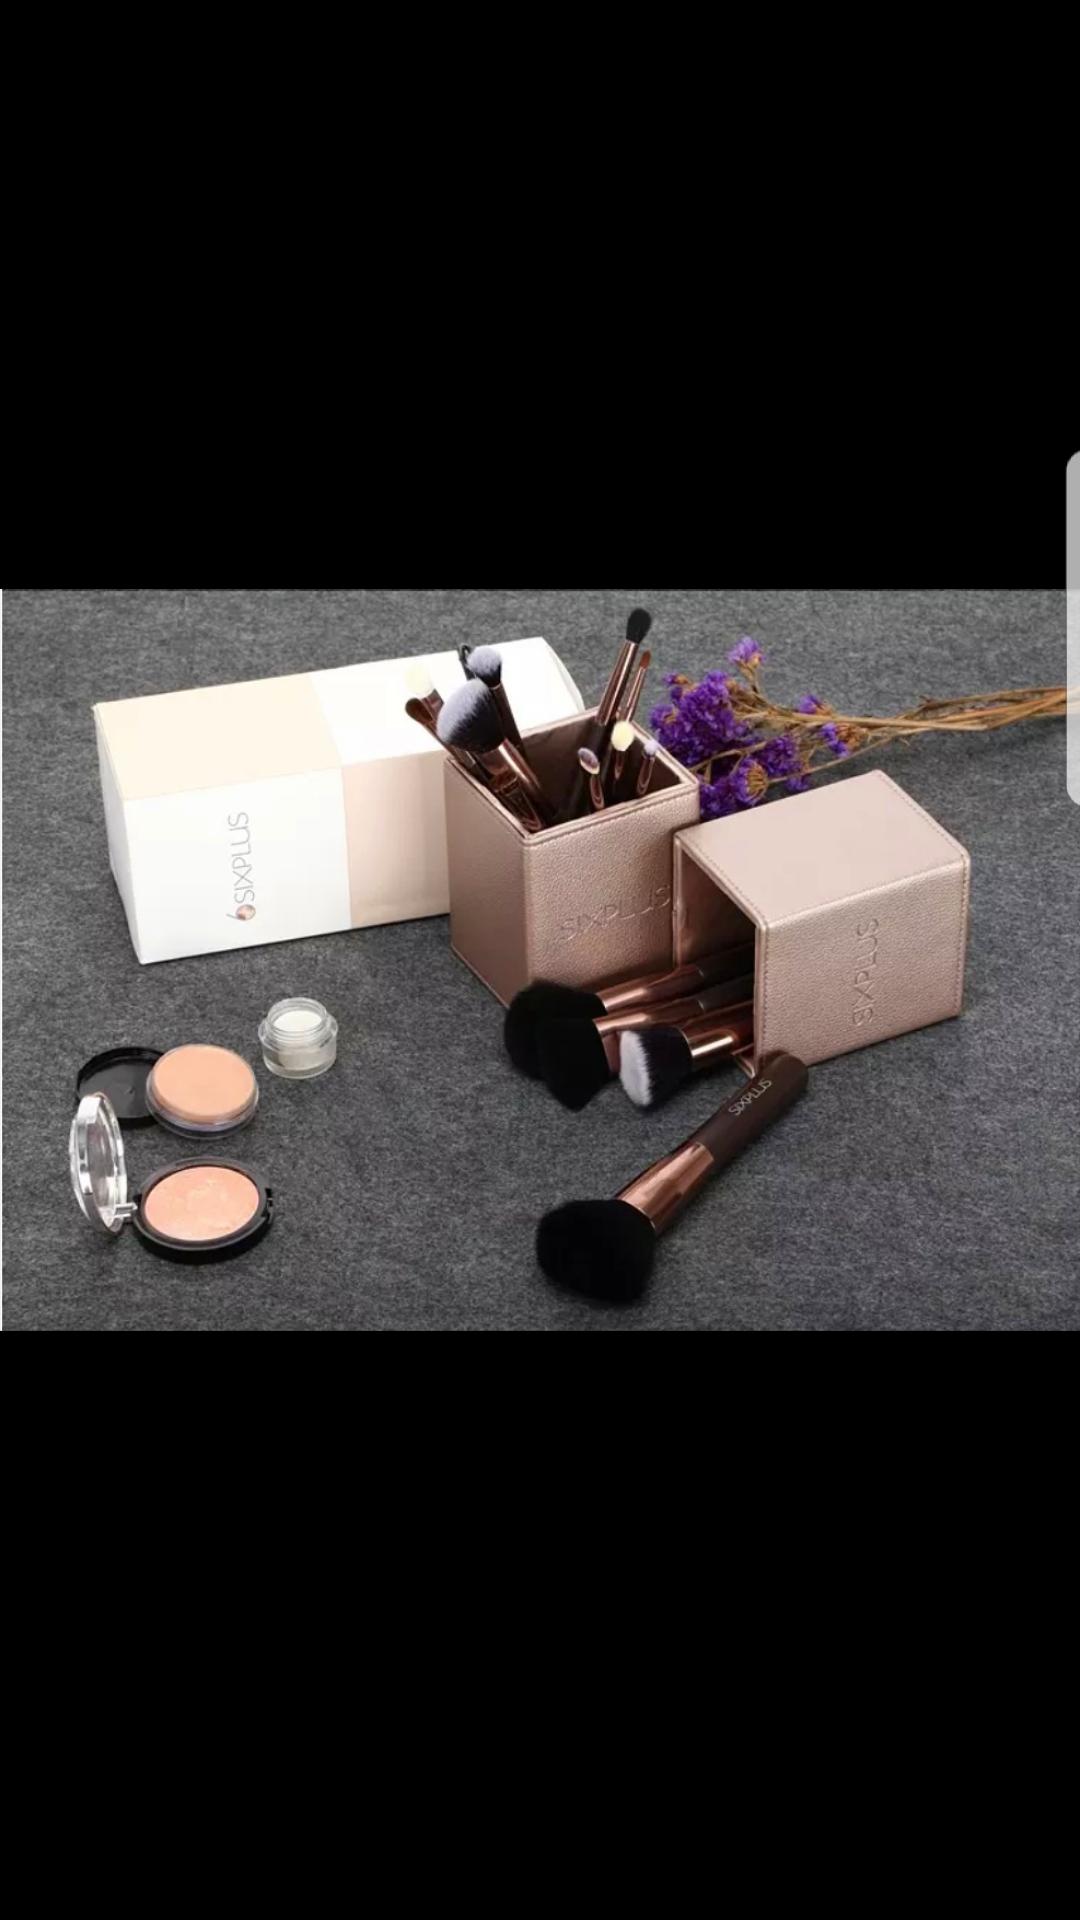 معلومات عن الاإعلان Sixplus makeup brushes 15pcs Coffee